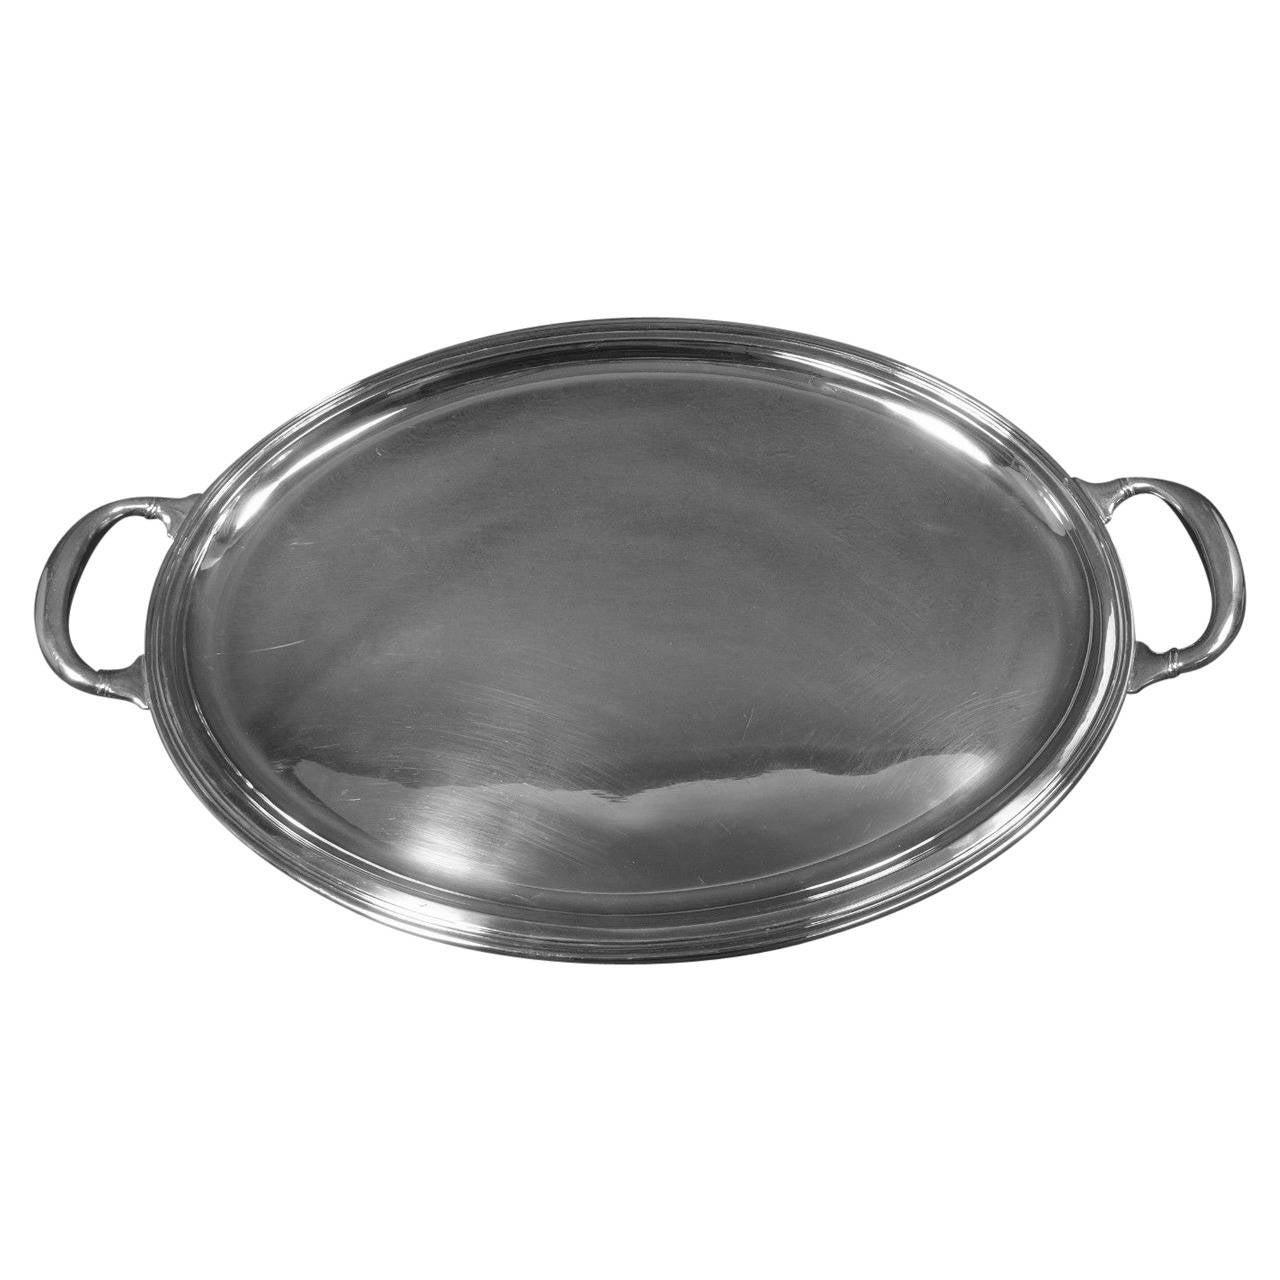 Buccellati Sterling Silver Italy Italian Tea Tray Hollowware